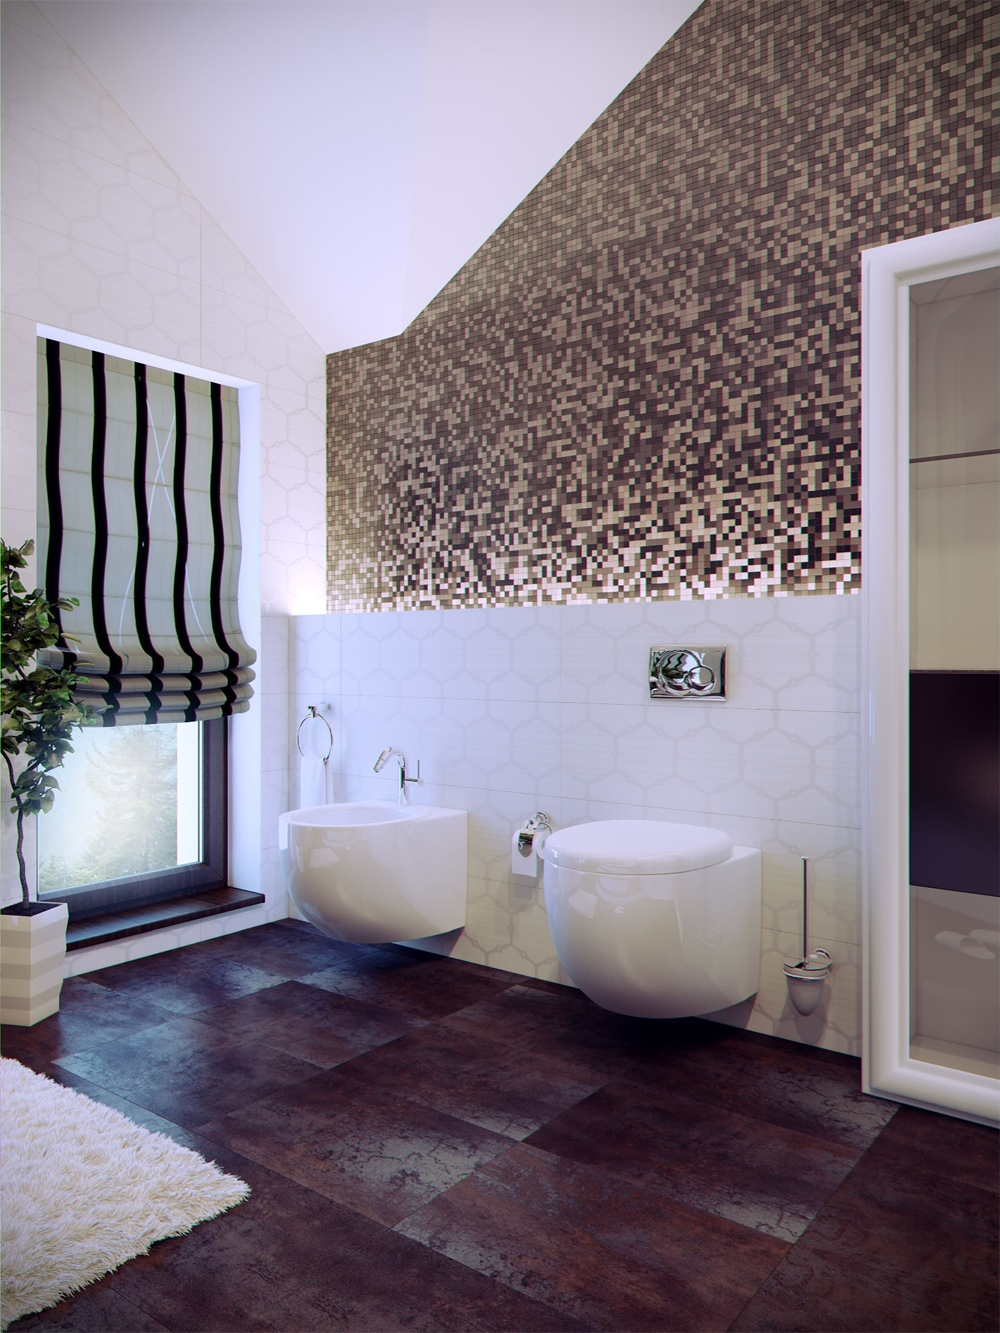 bathroom tile designs modern photo - 4